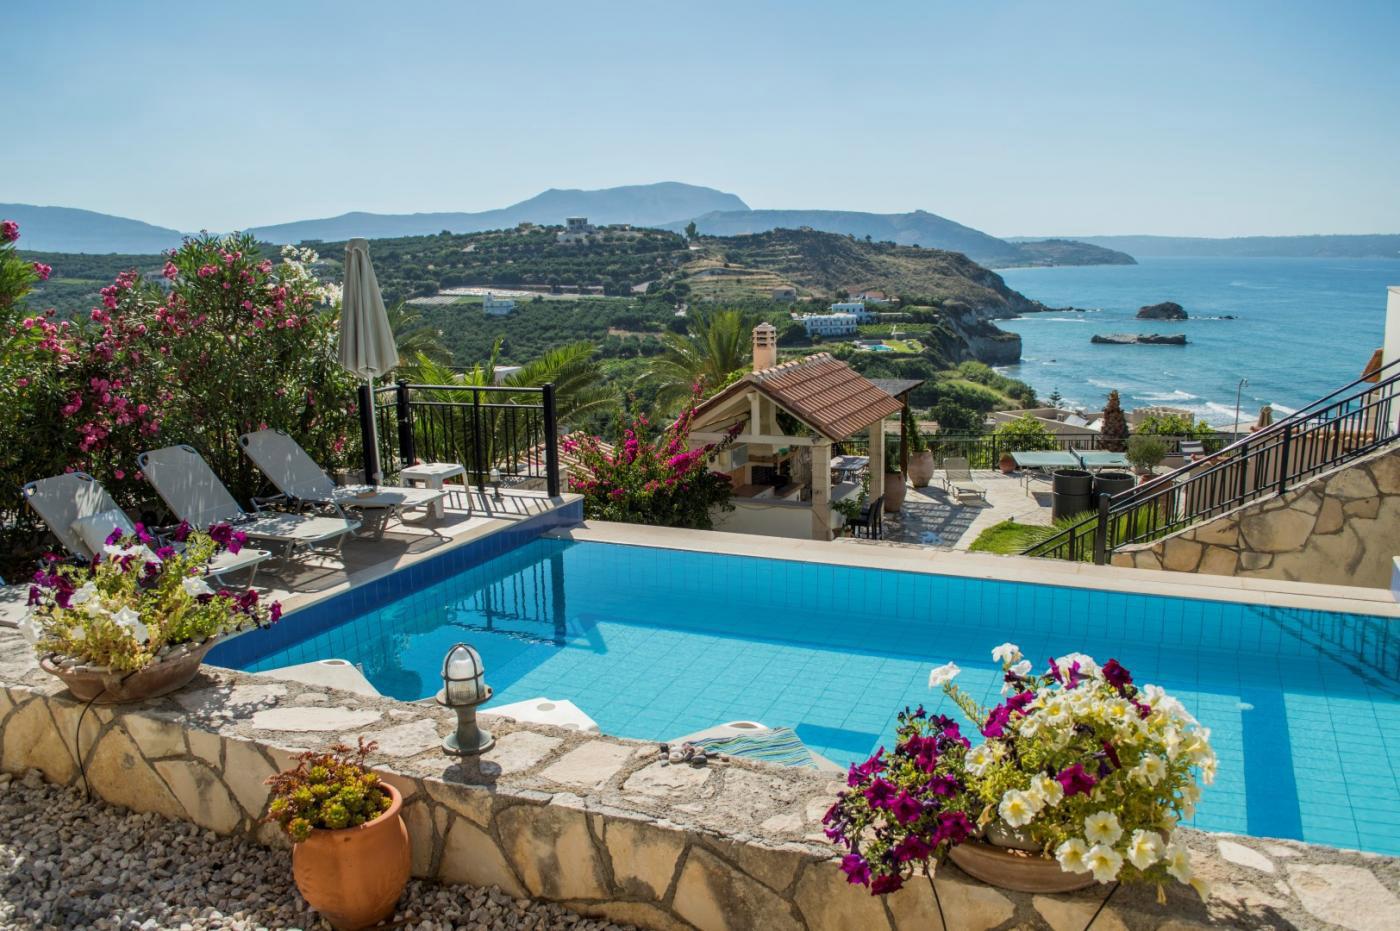 Aegean Blue Villa Villas In Almyrida Crete Escapes